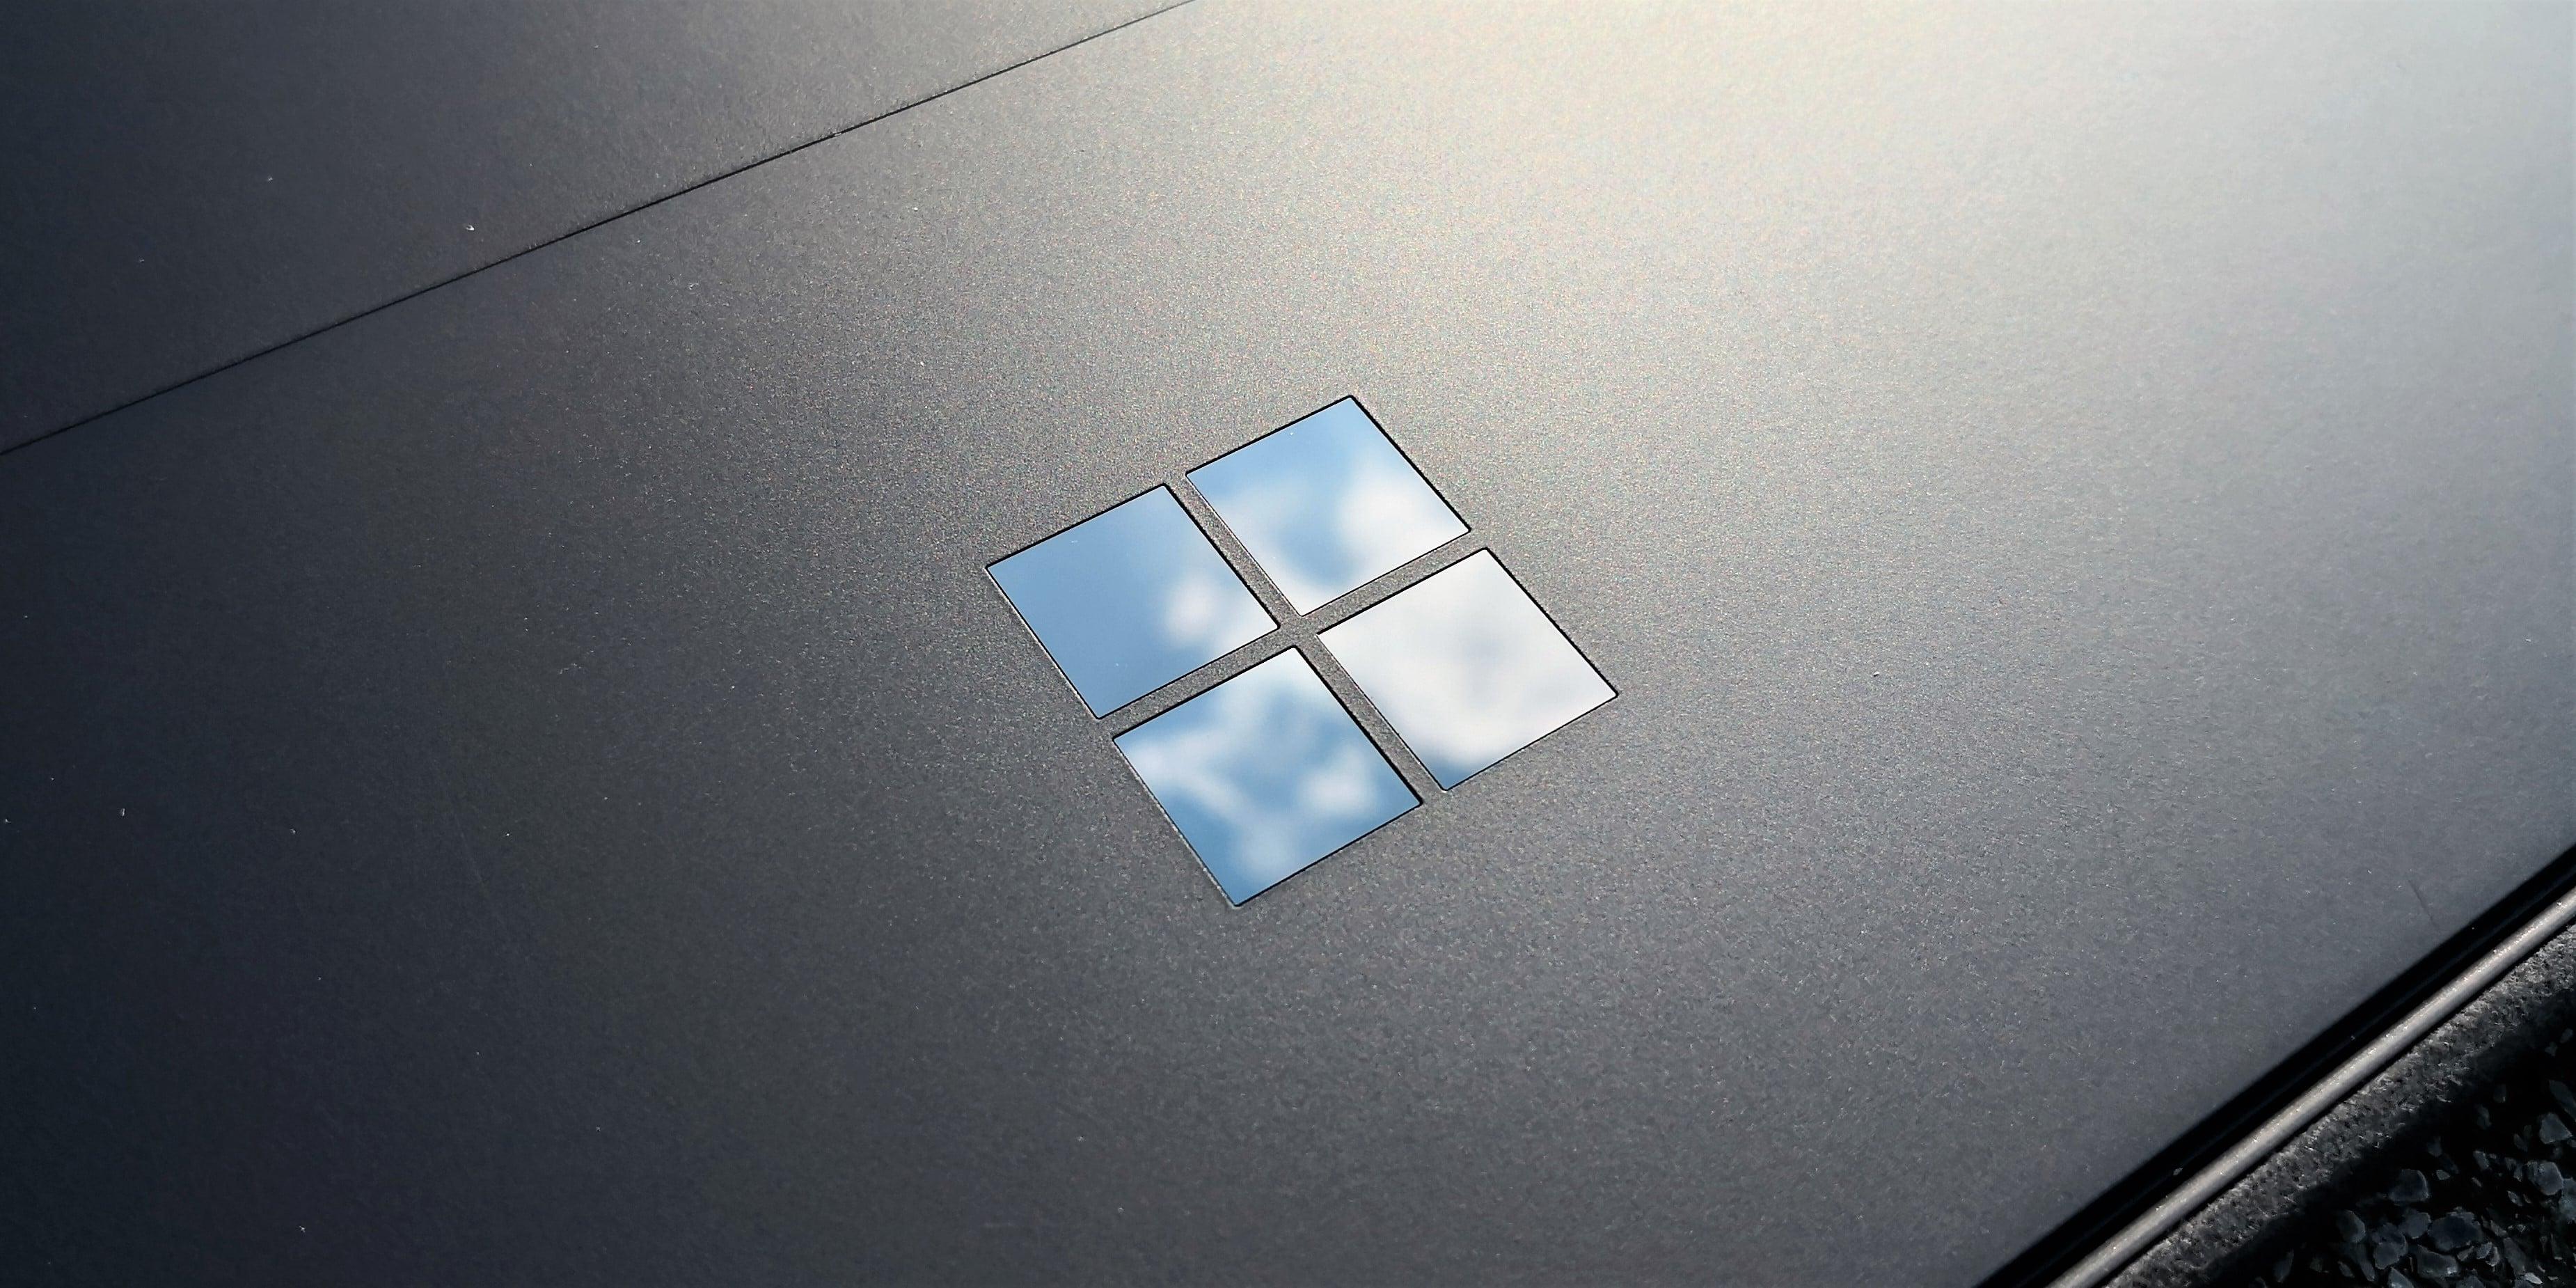 Po aktualizacji Microsoftu, procesory Surface Pro 6 i Surface Book 2 blokują się na 400 MHz